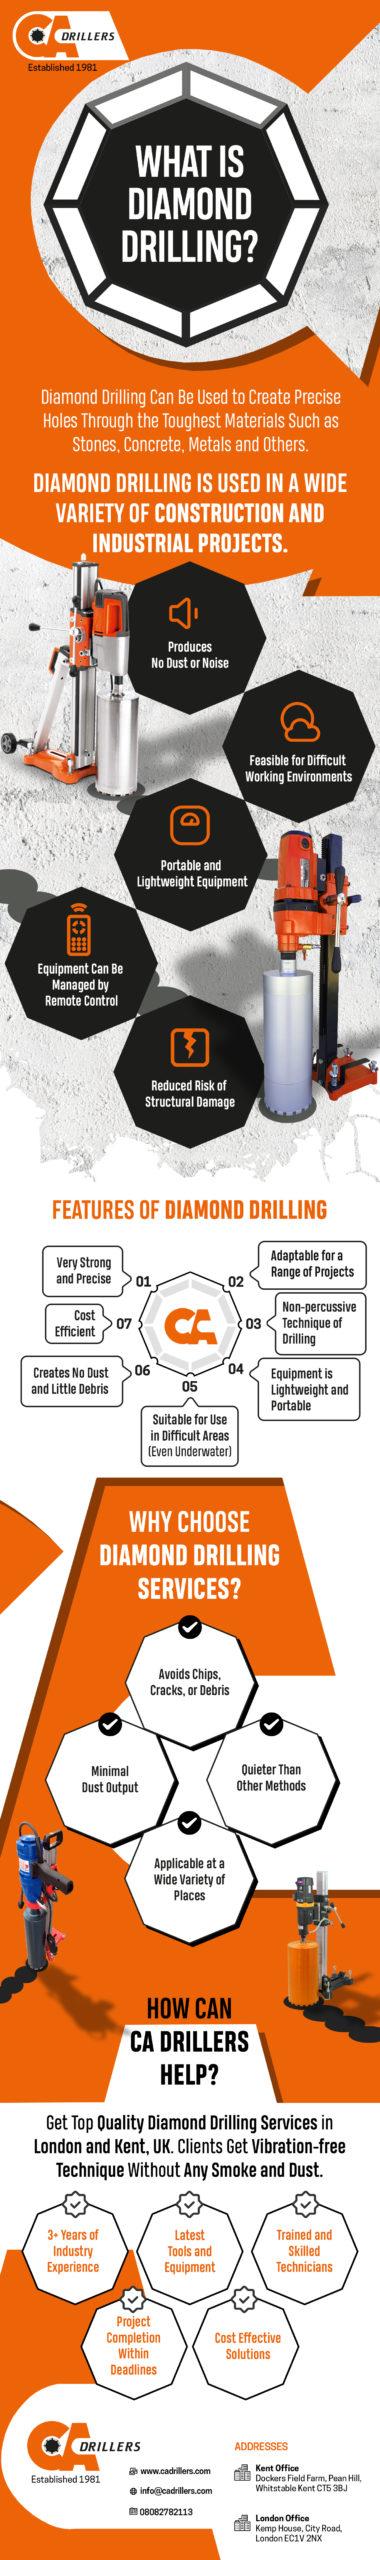 Diamond Drilling